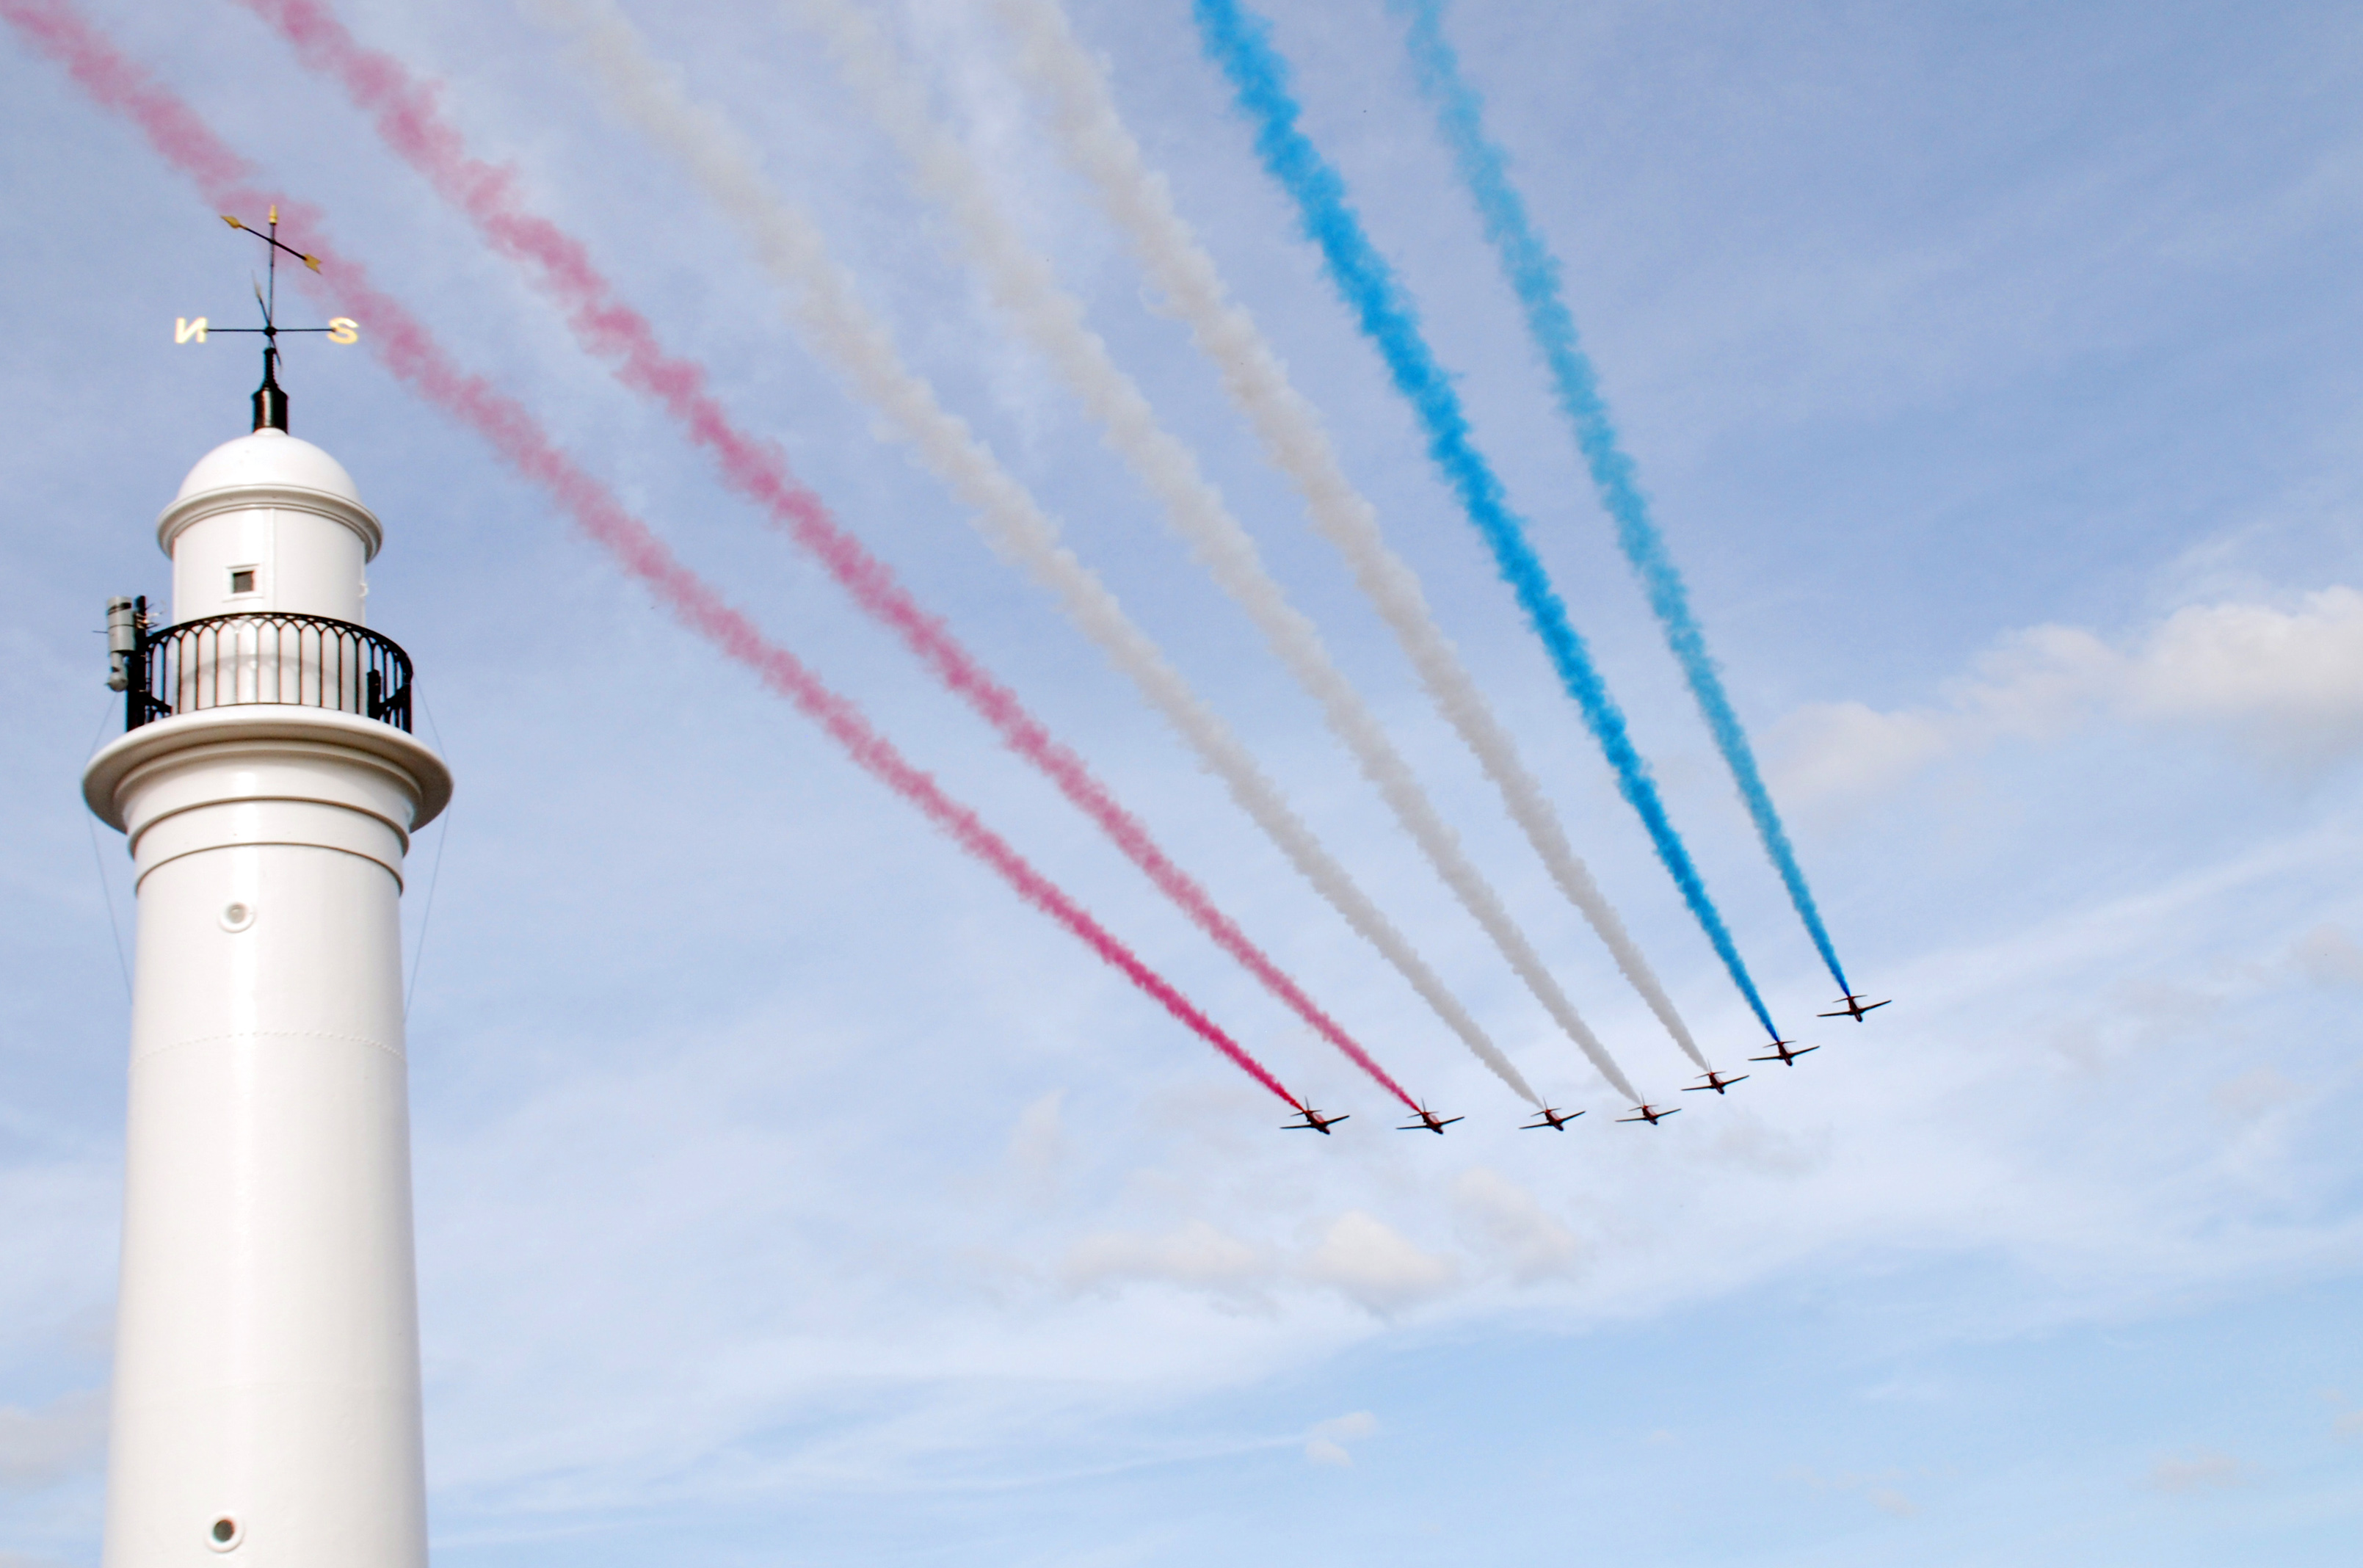 Sunderland airshow